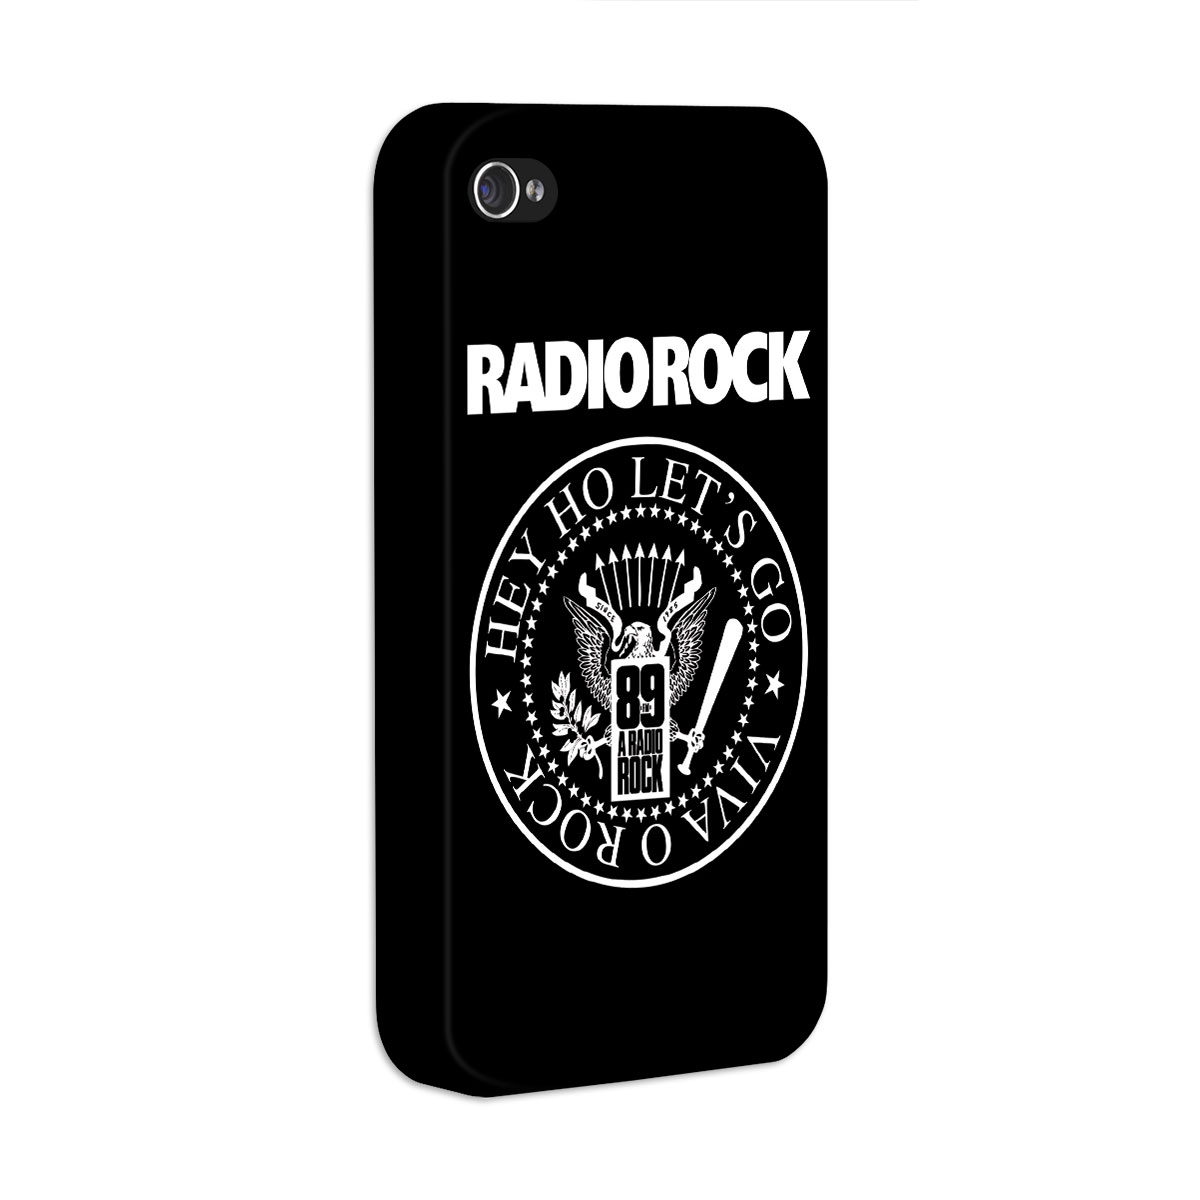 Capa de iPhone 4/4S 89 FM - Hey Ho Viva o Rock